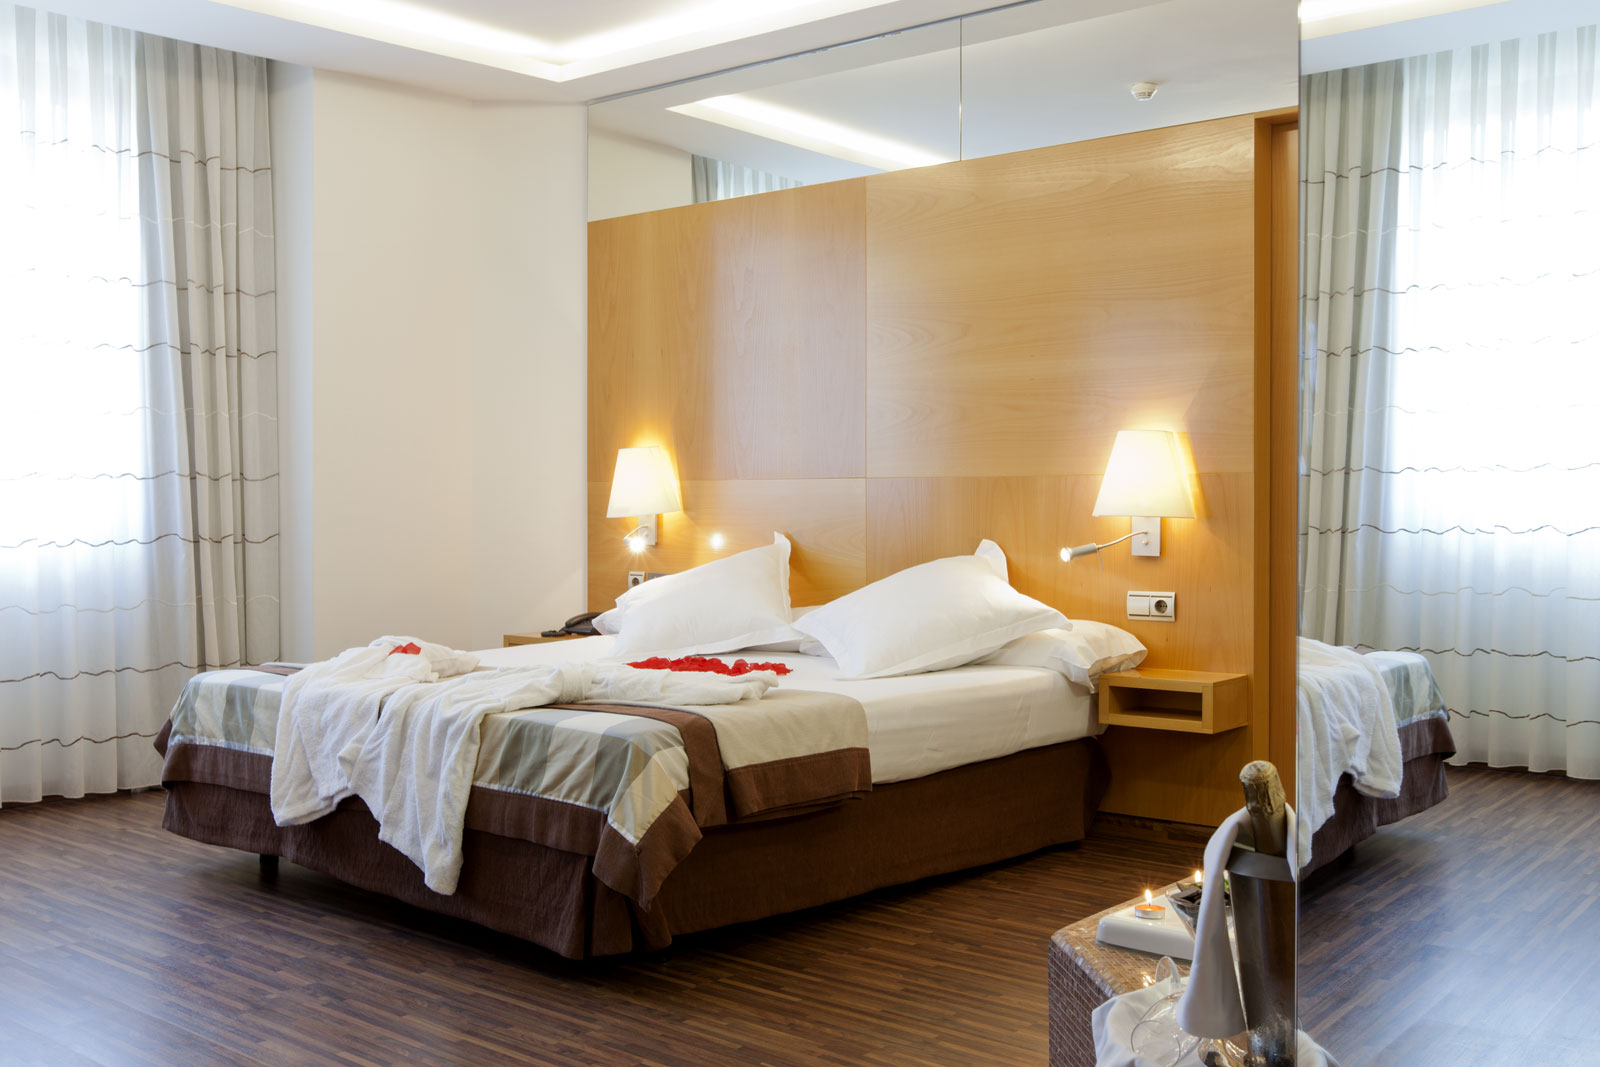 Chambres jacuzzi suite h tel sb icaria barcelona officiel for Chambre avec jacuzzi barcelone